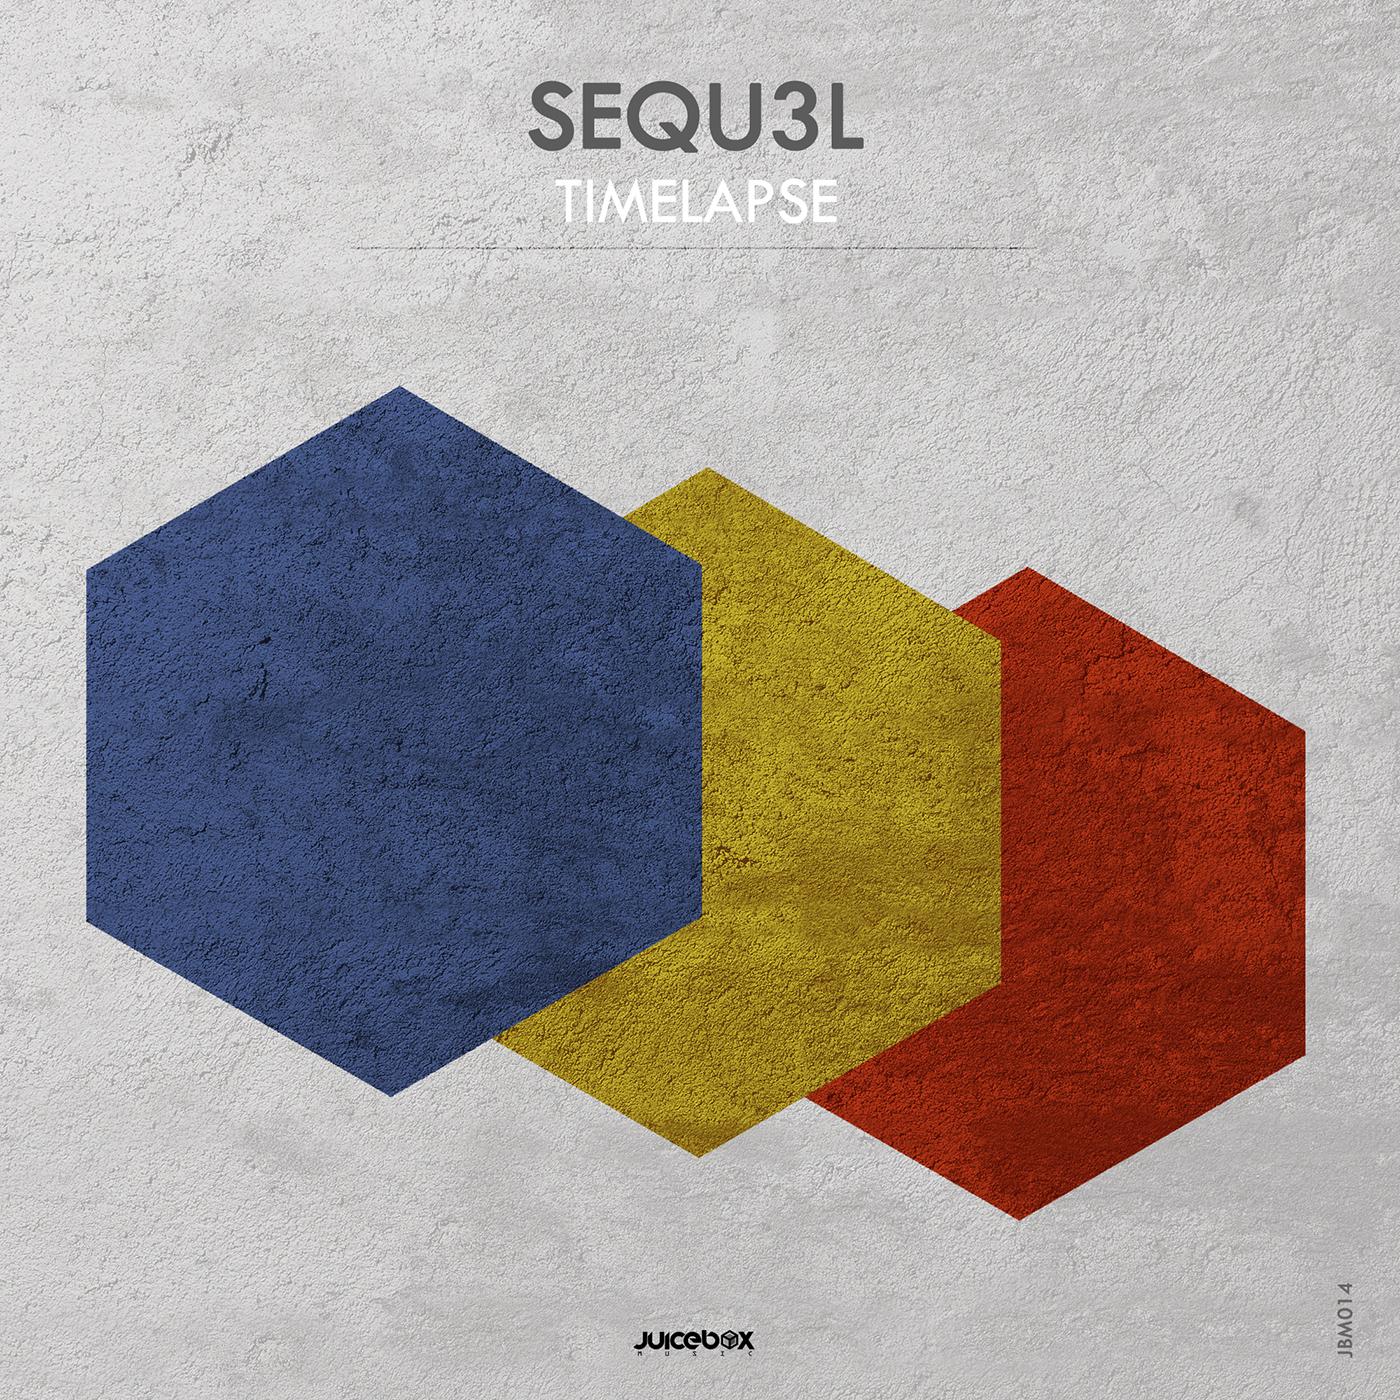 SEQU3l - Timelapse (Juicebox Music)